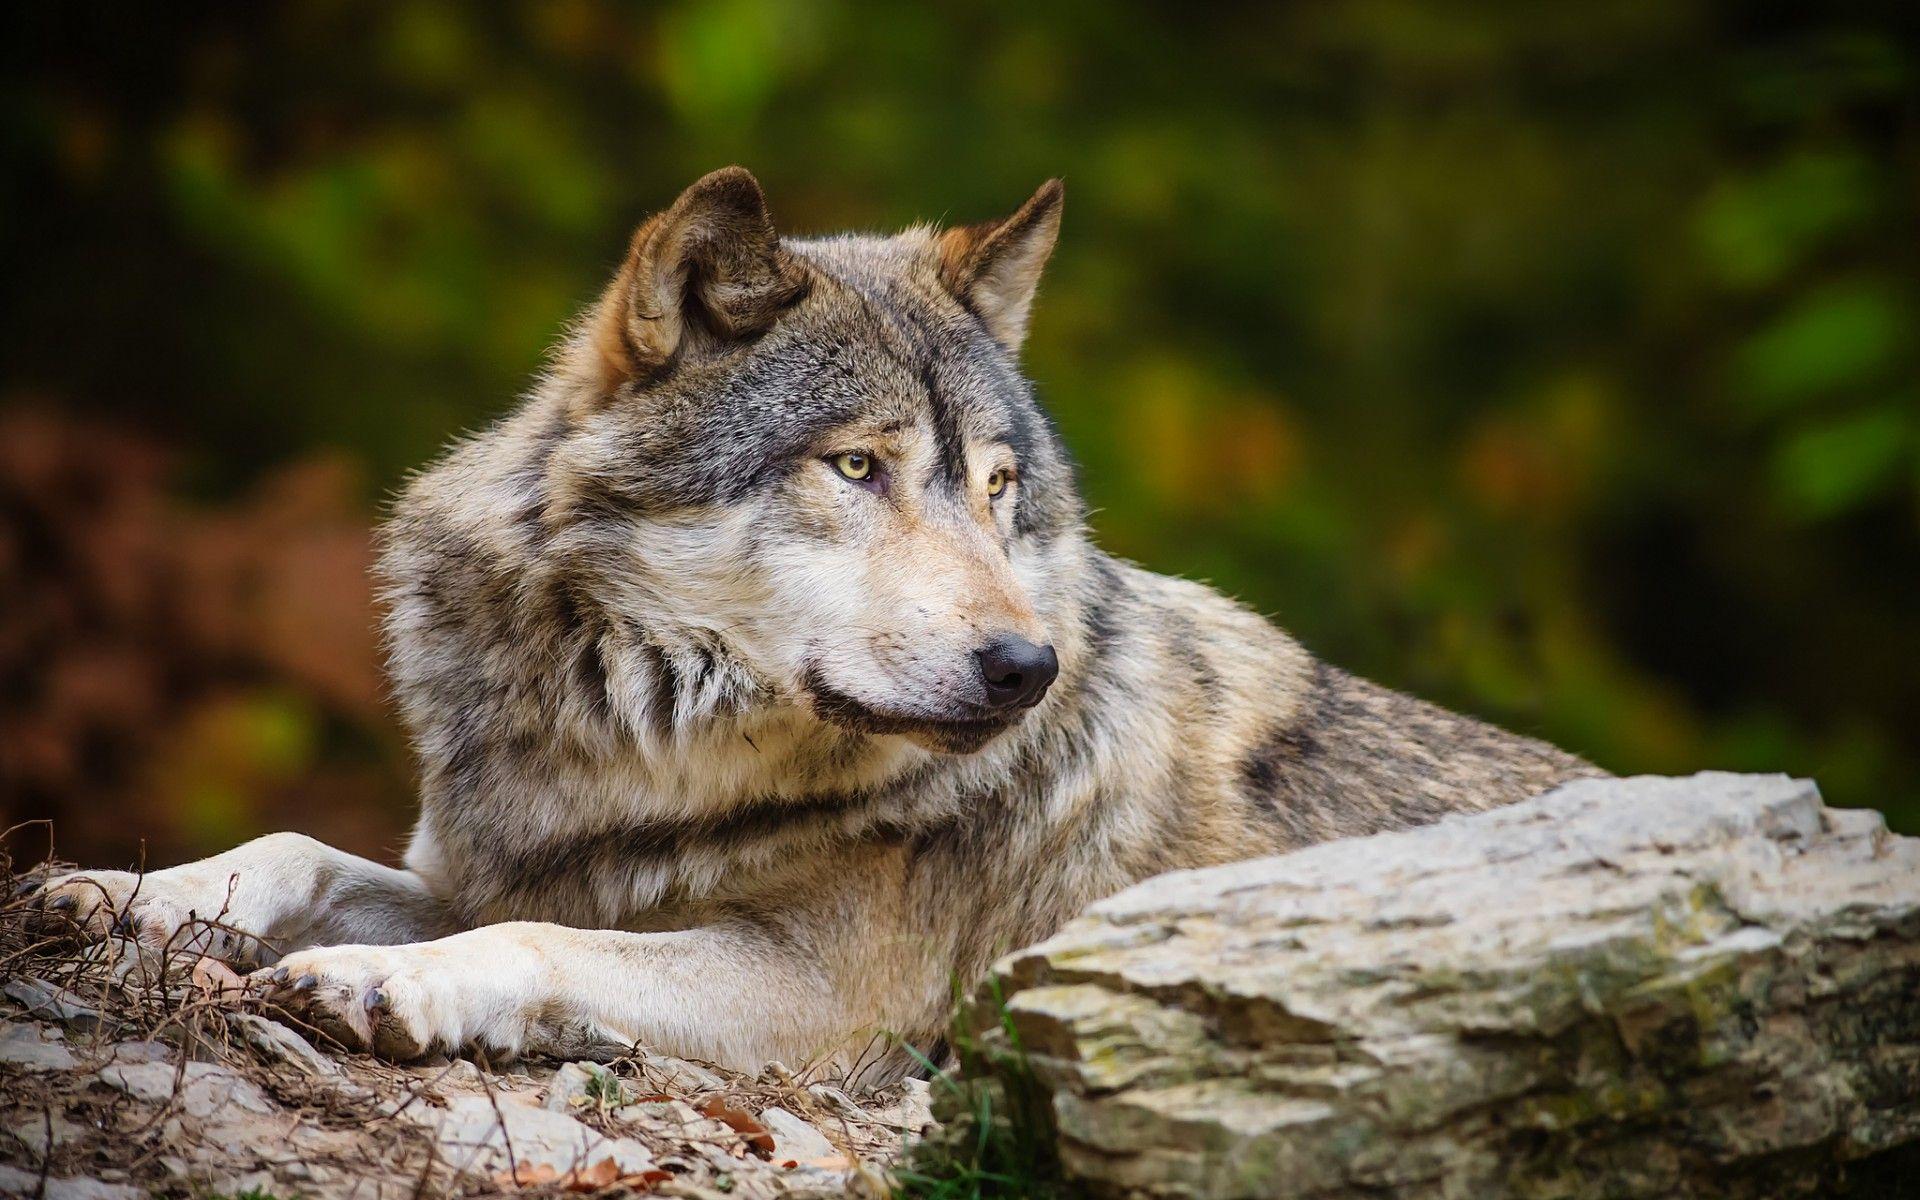 лиф фото волка одиночки на рабочий стол жизни, как